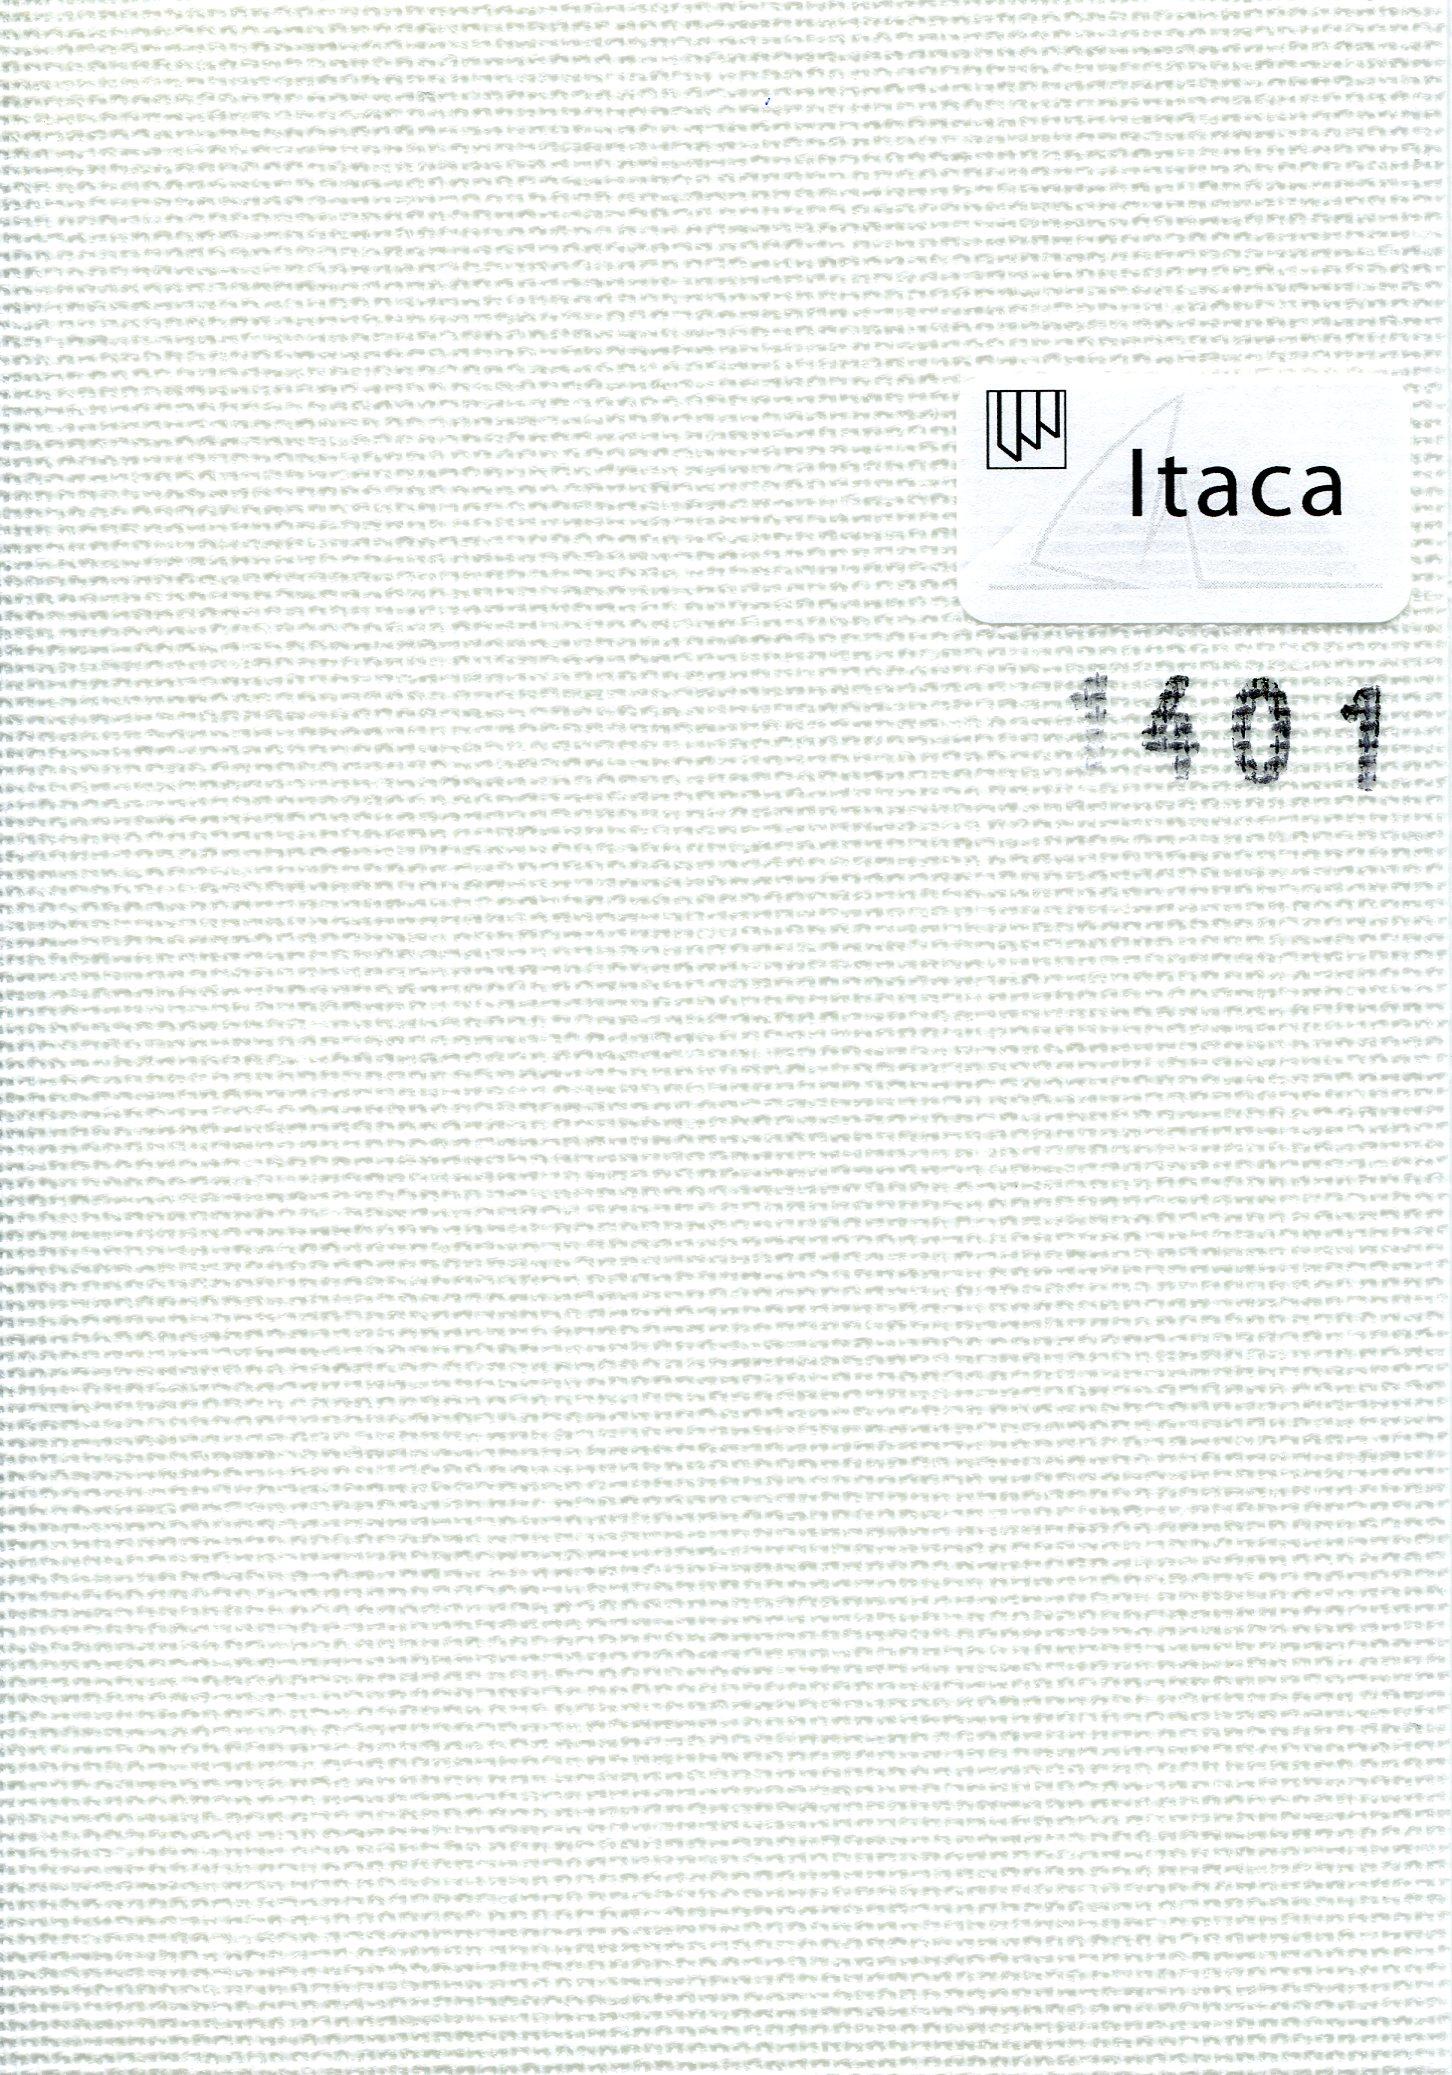 Itaca 1401